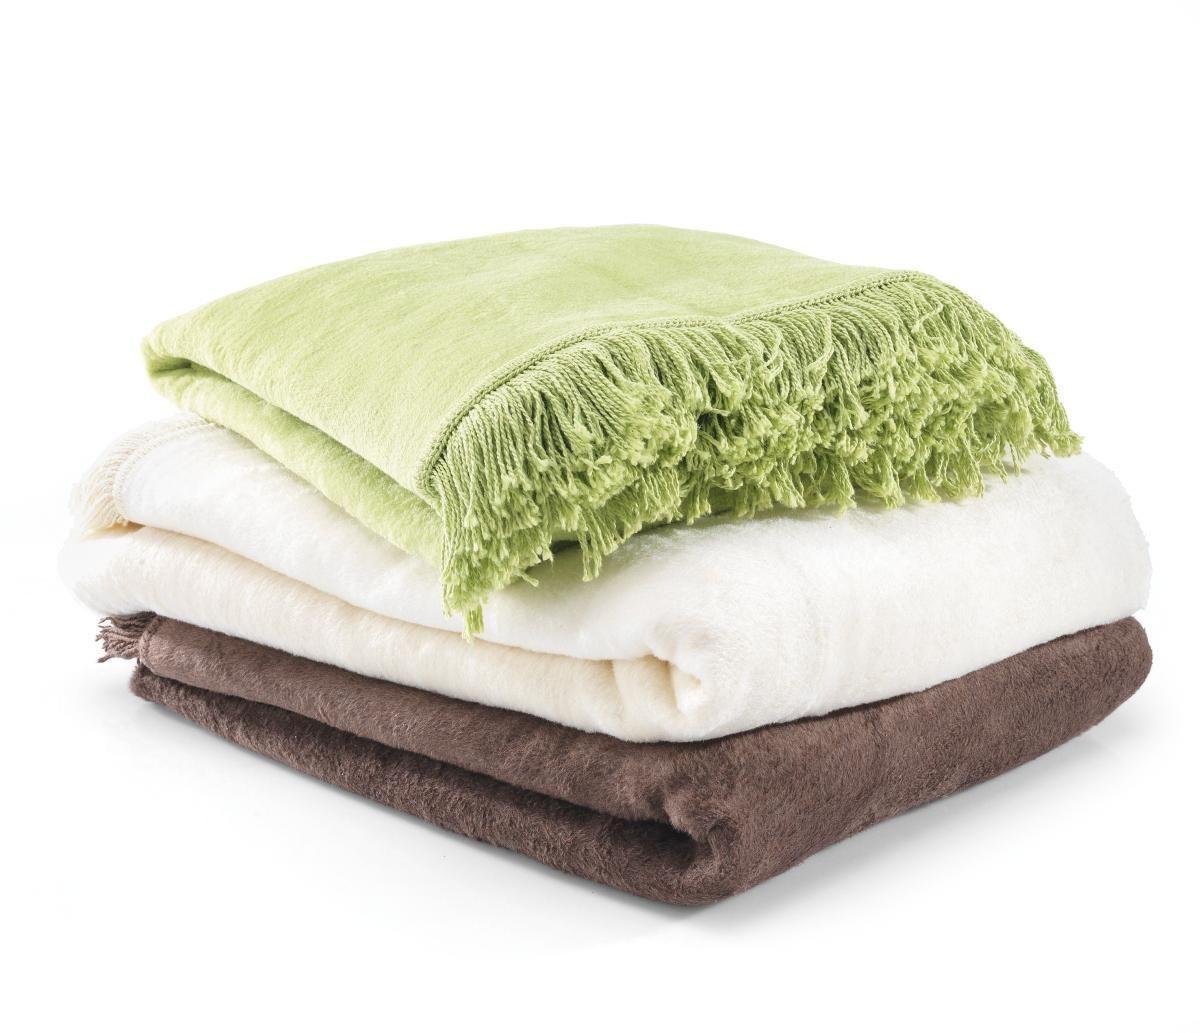 Ágytakaró El Sol - zöld, textil (150/200cm) - MÖMAX modern living